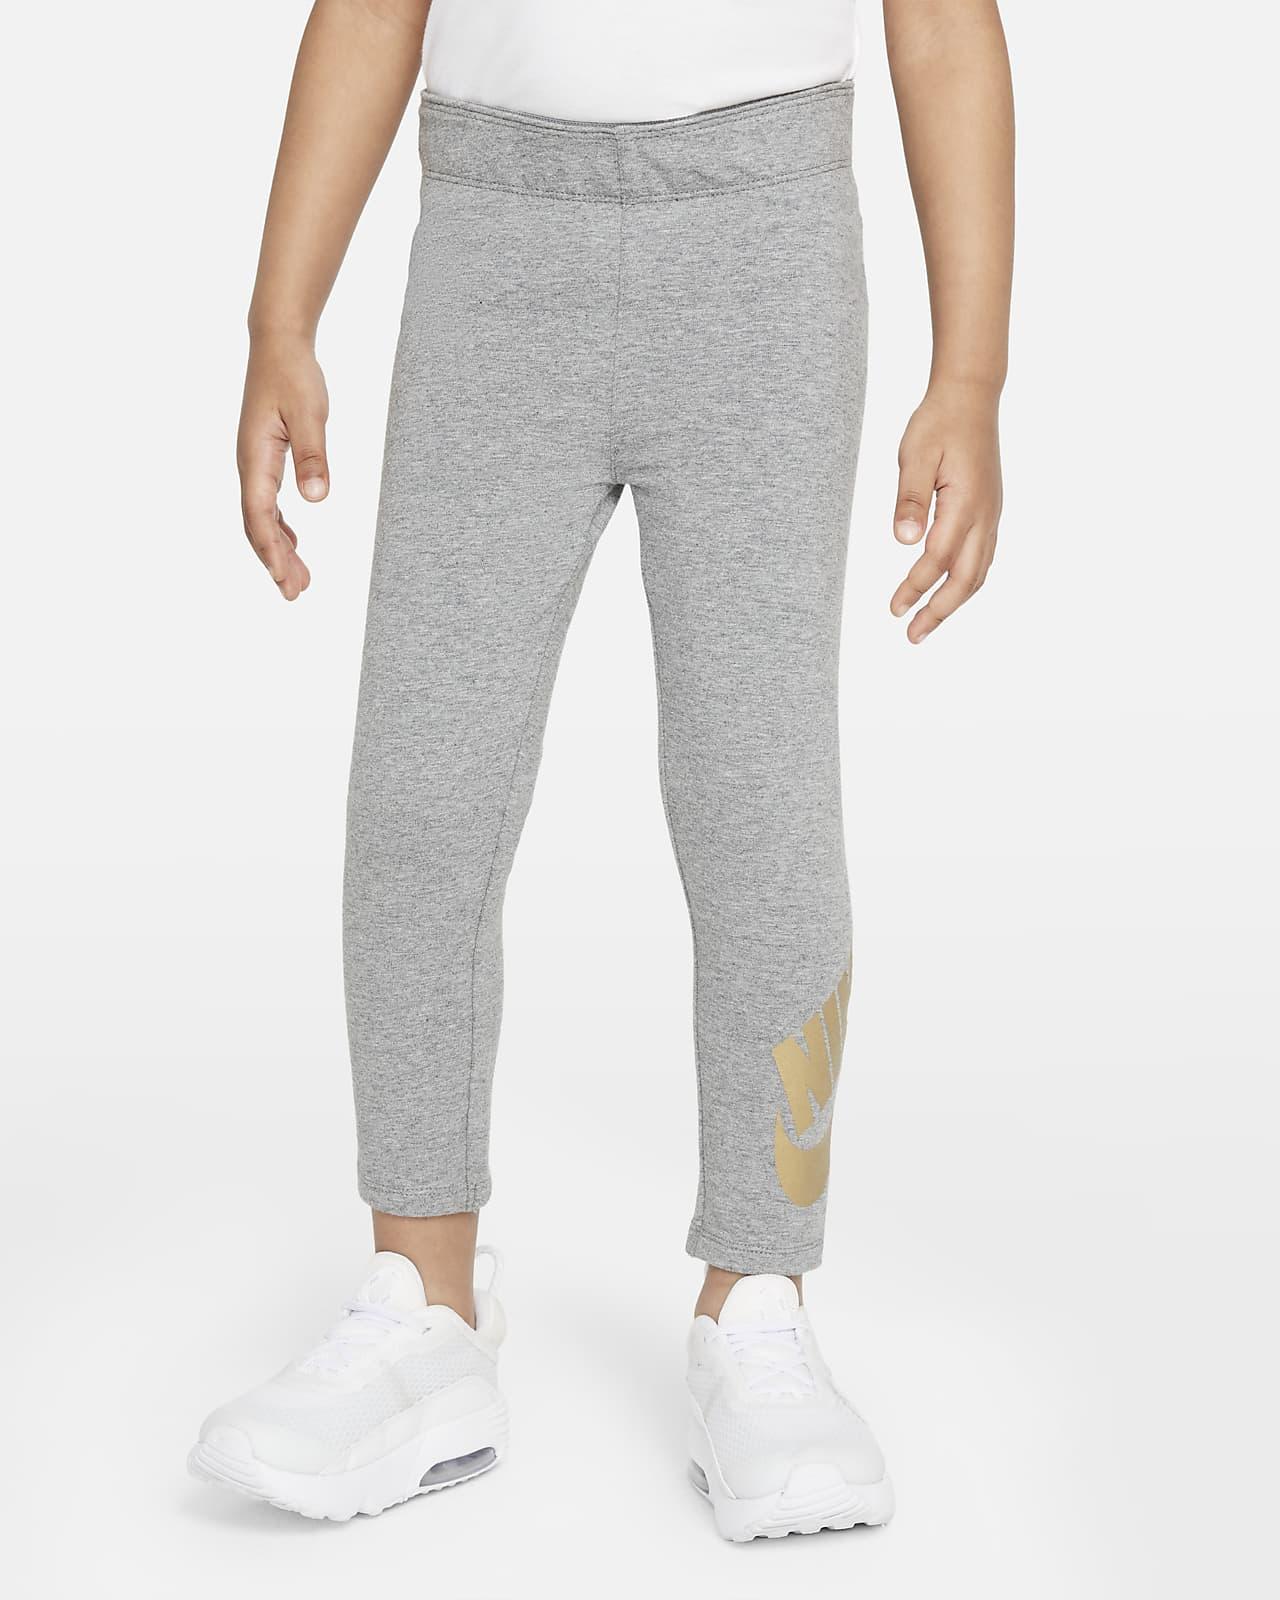 Nike Capri-Leggings für Kleinkinder